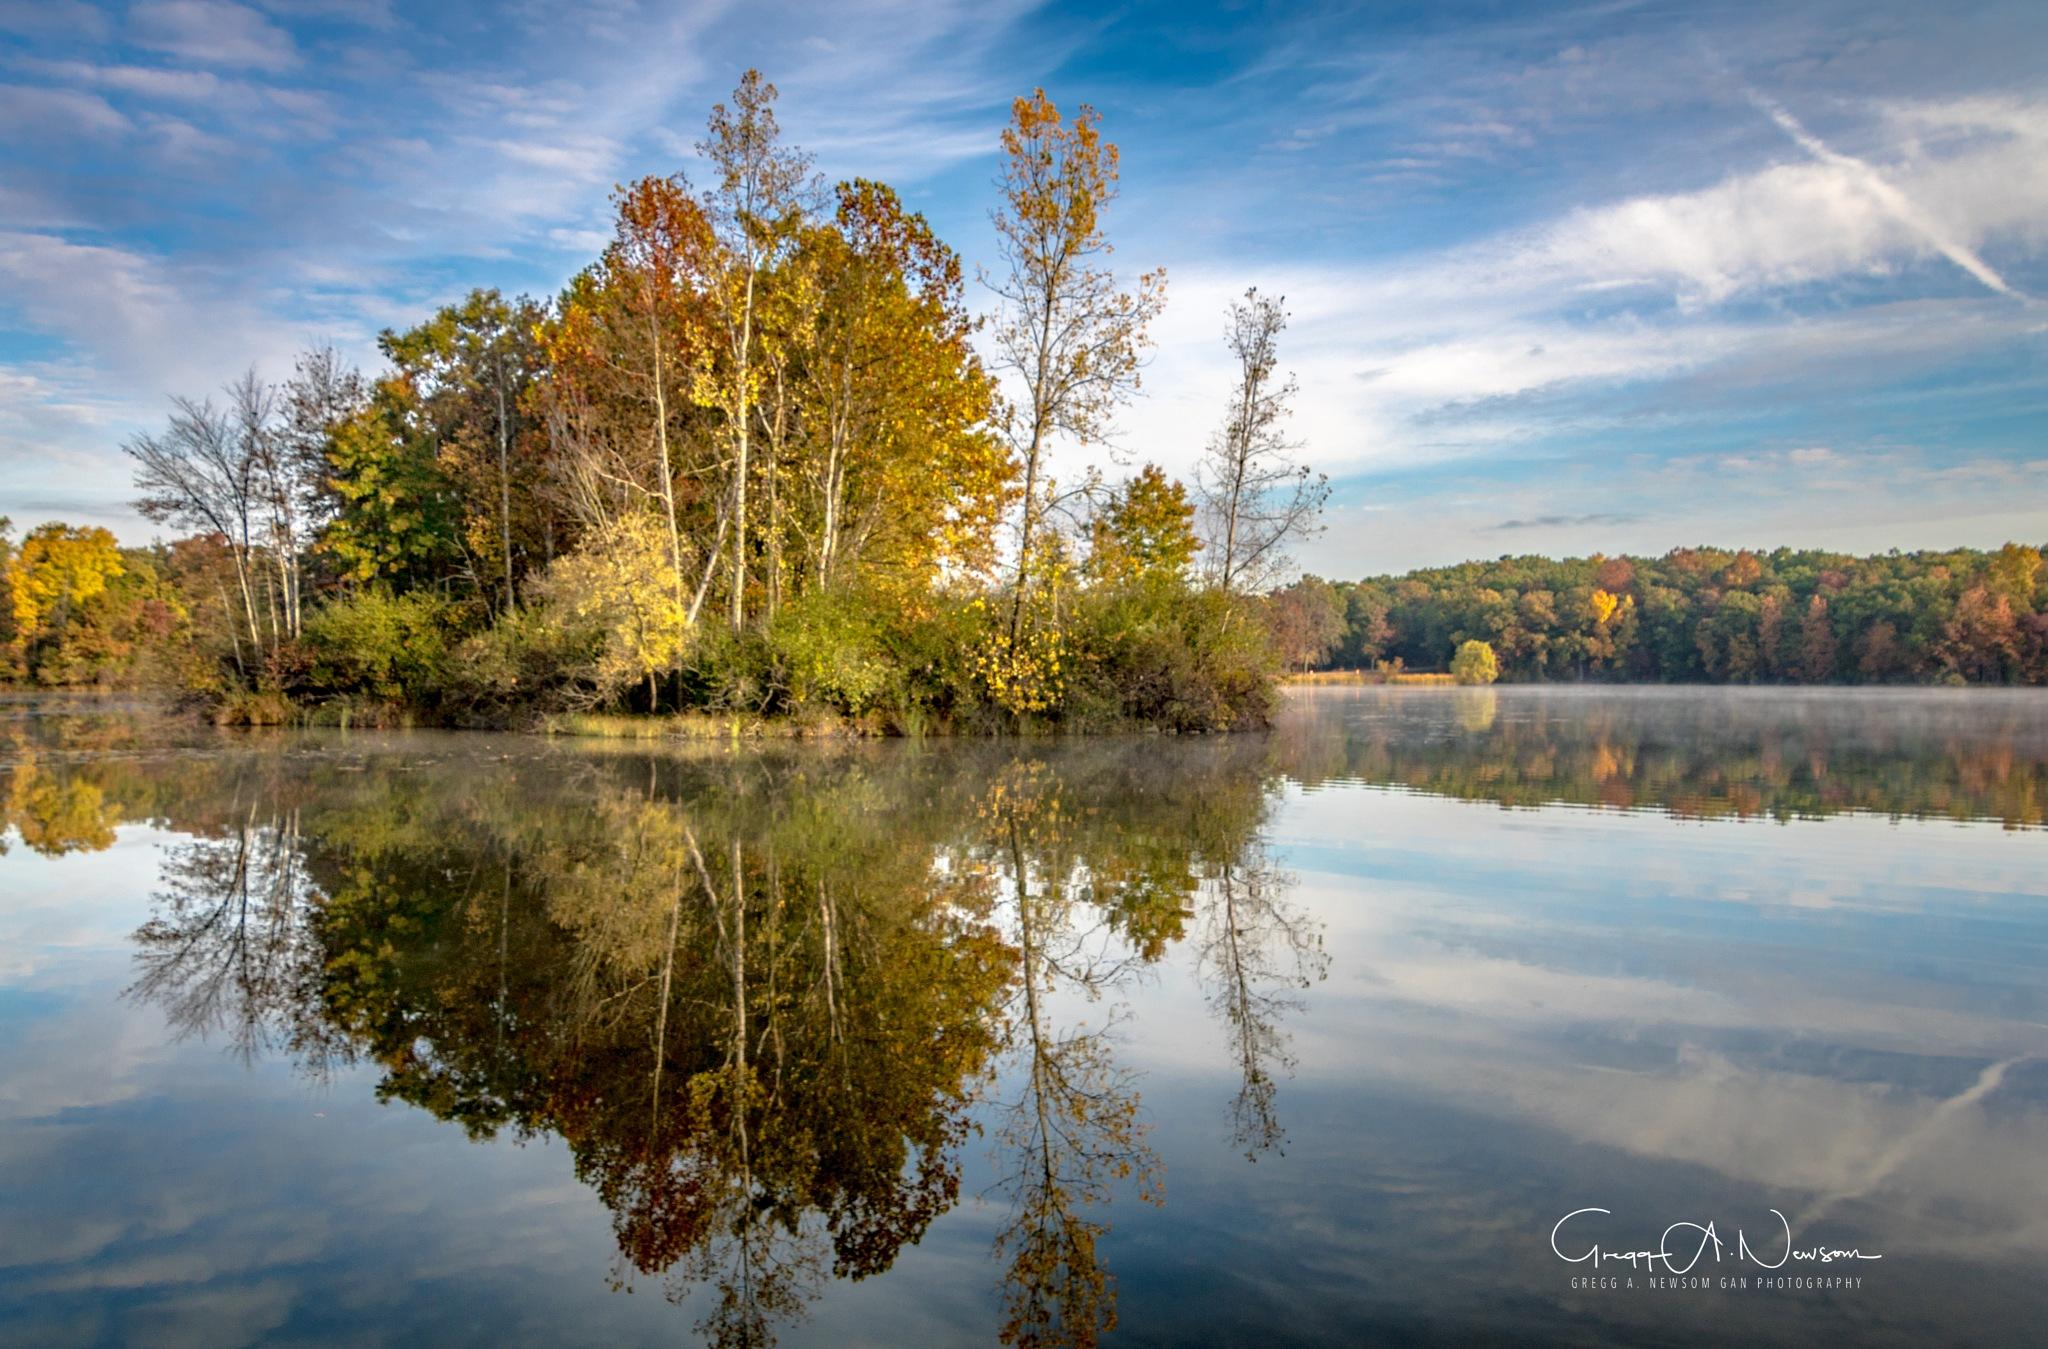 Reflections 5 by Gnewsom324